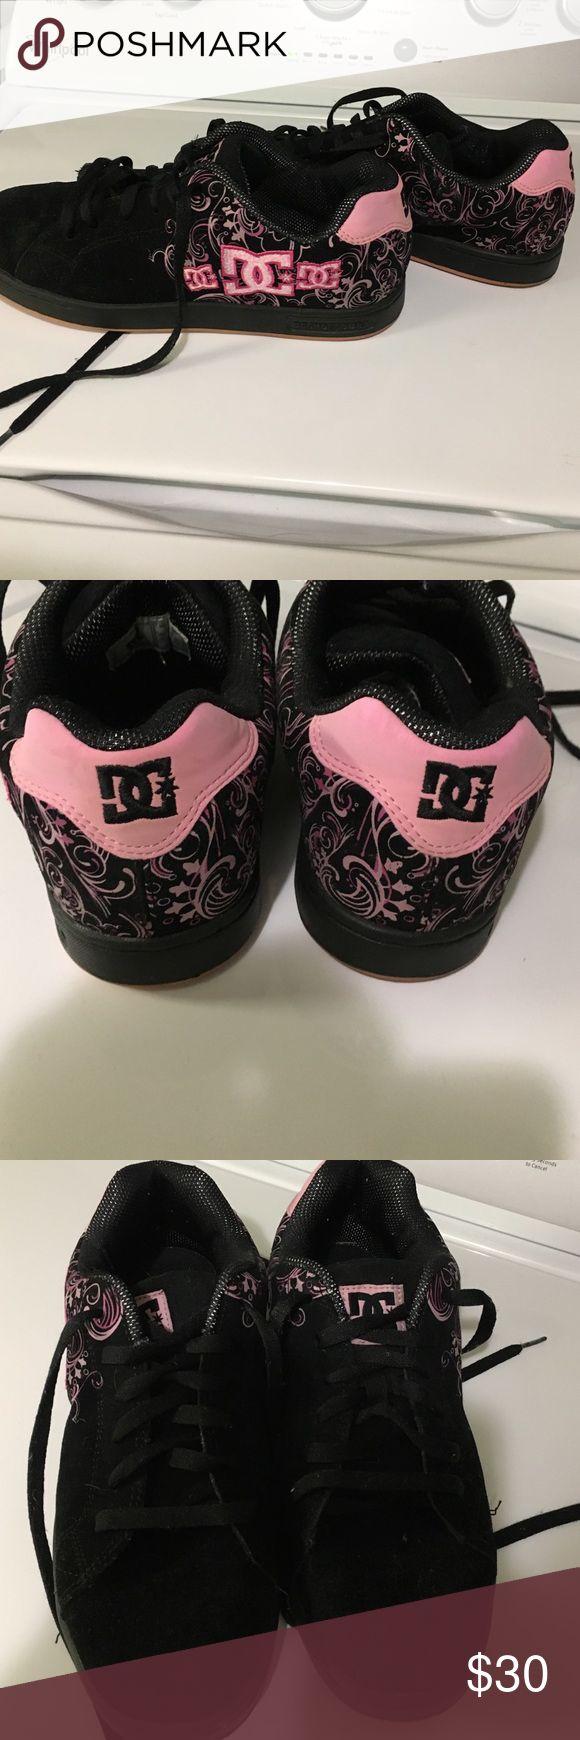 "Black and pink ""skateboard"" shoes-chunky shoe Worn twice very sturdy shoe DG shoe co USA Shoes Sneakers"